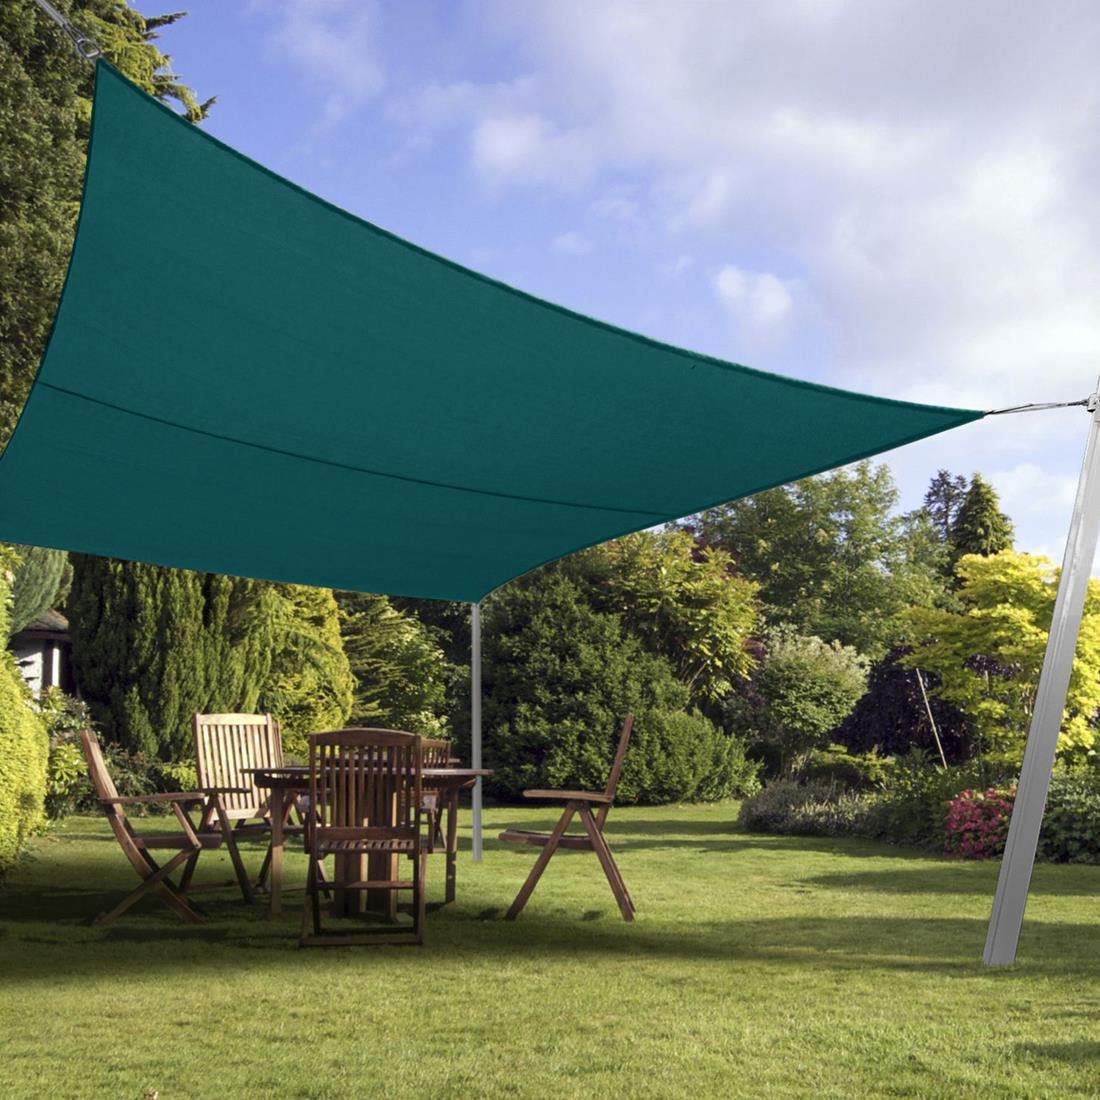 Backyard Sails Shades: Quictent 24 X 24 FT Square Sun Shade Sail Outdoor Patio